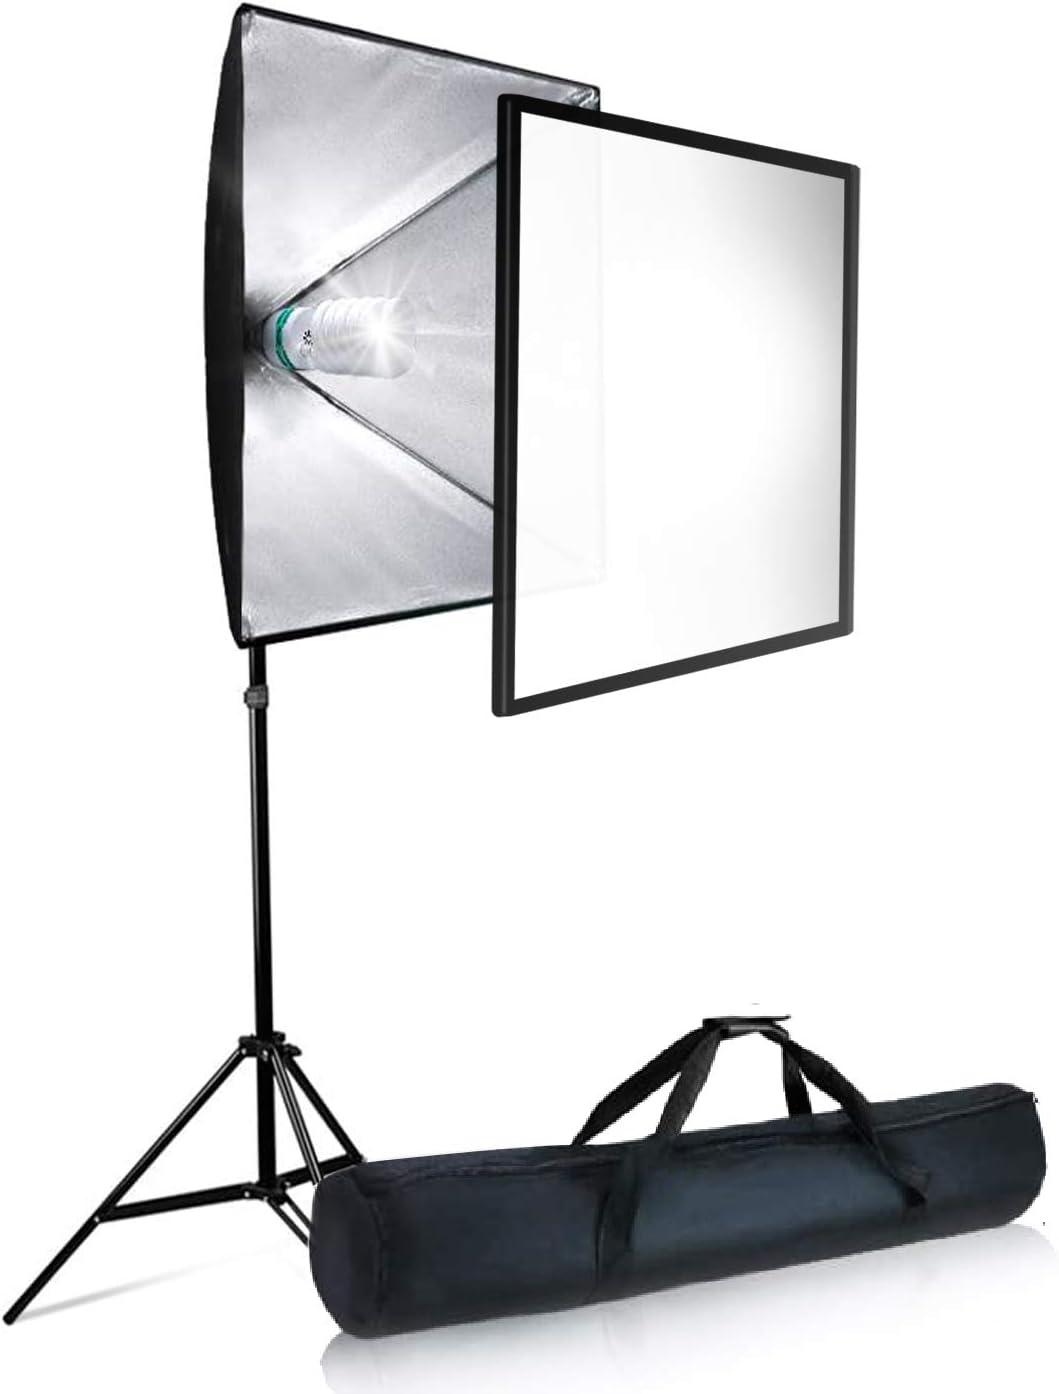 LimoStudio 700W Photo Video Studio Soft Box Lighting Kit Photography Studio AGG2767 24 x 24 Inch Dimension Softbox Light Reflector with 85W CFL Bulb